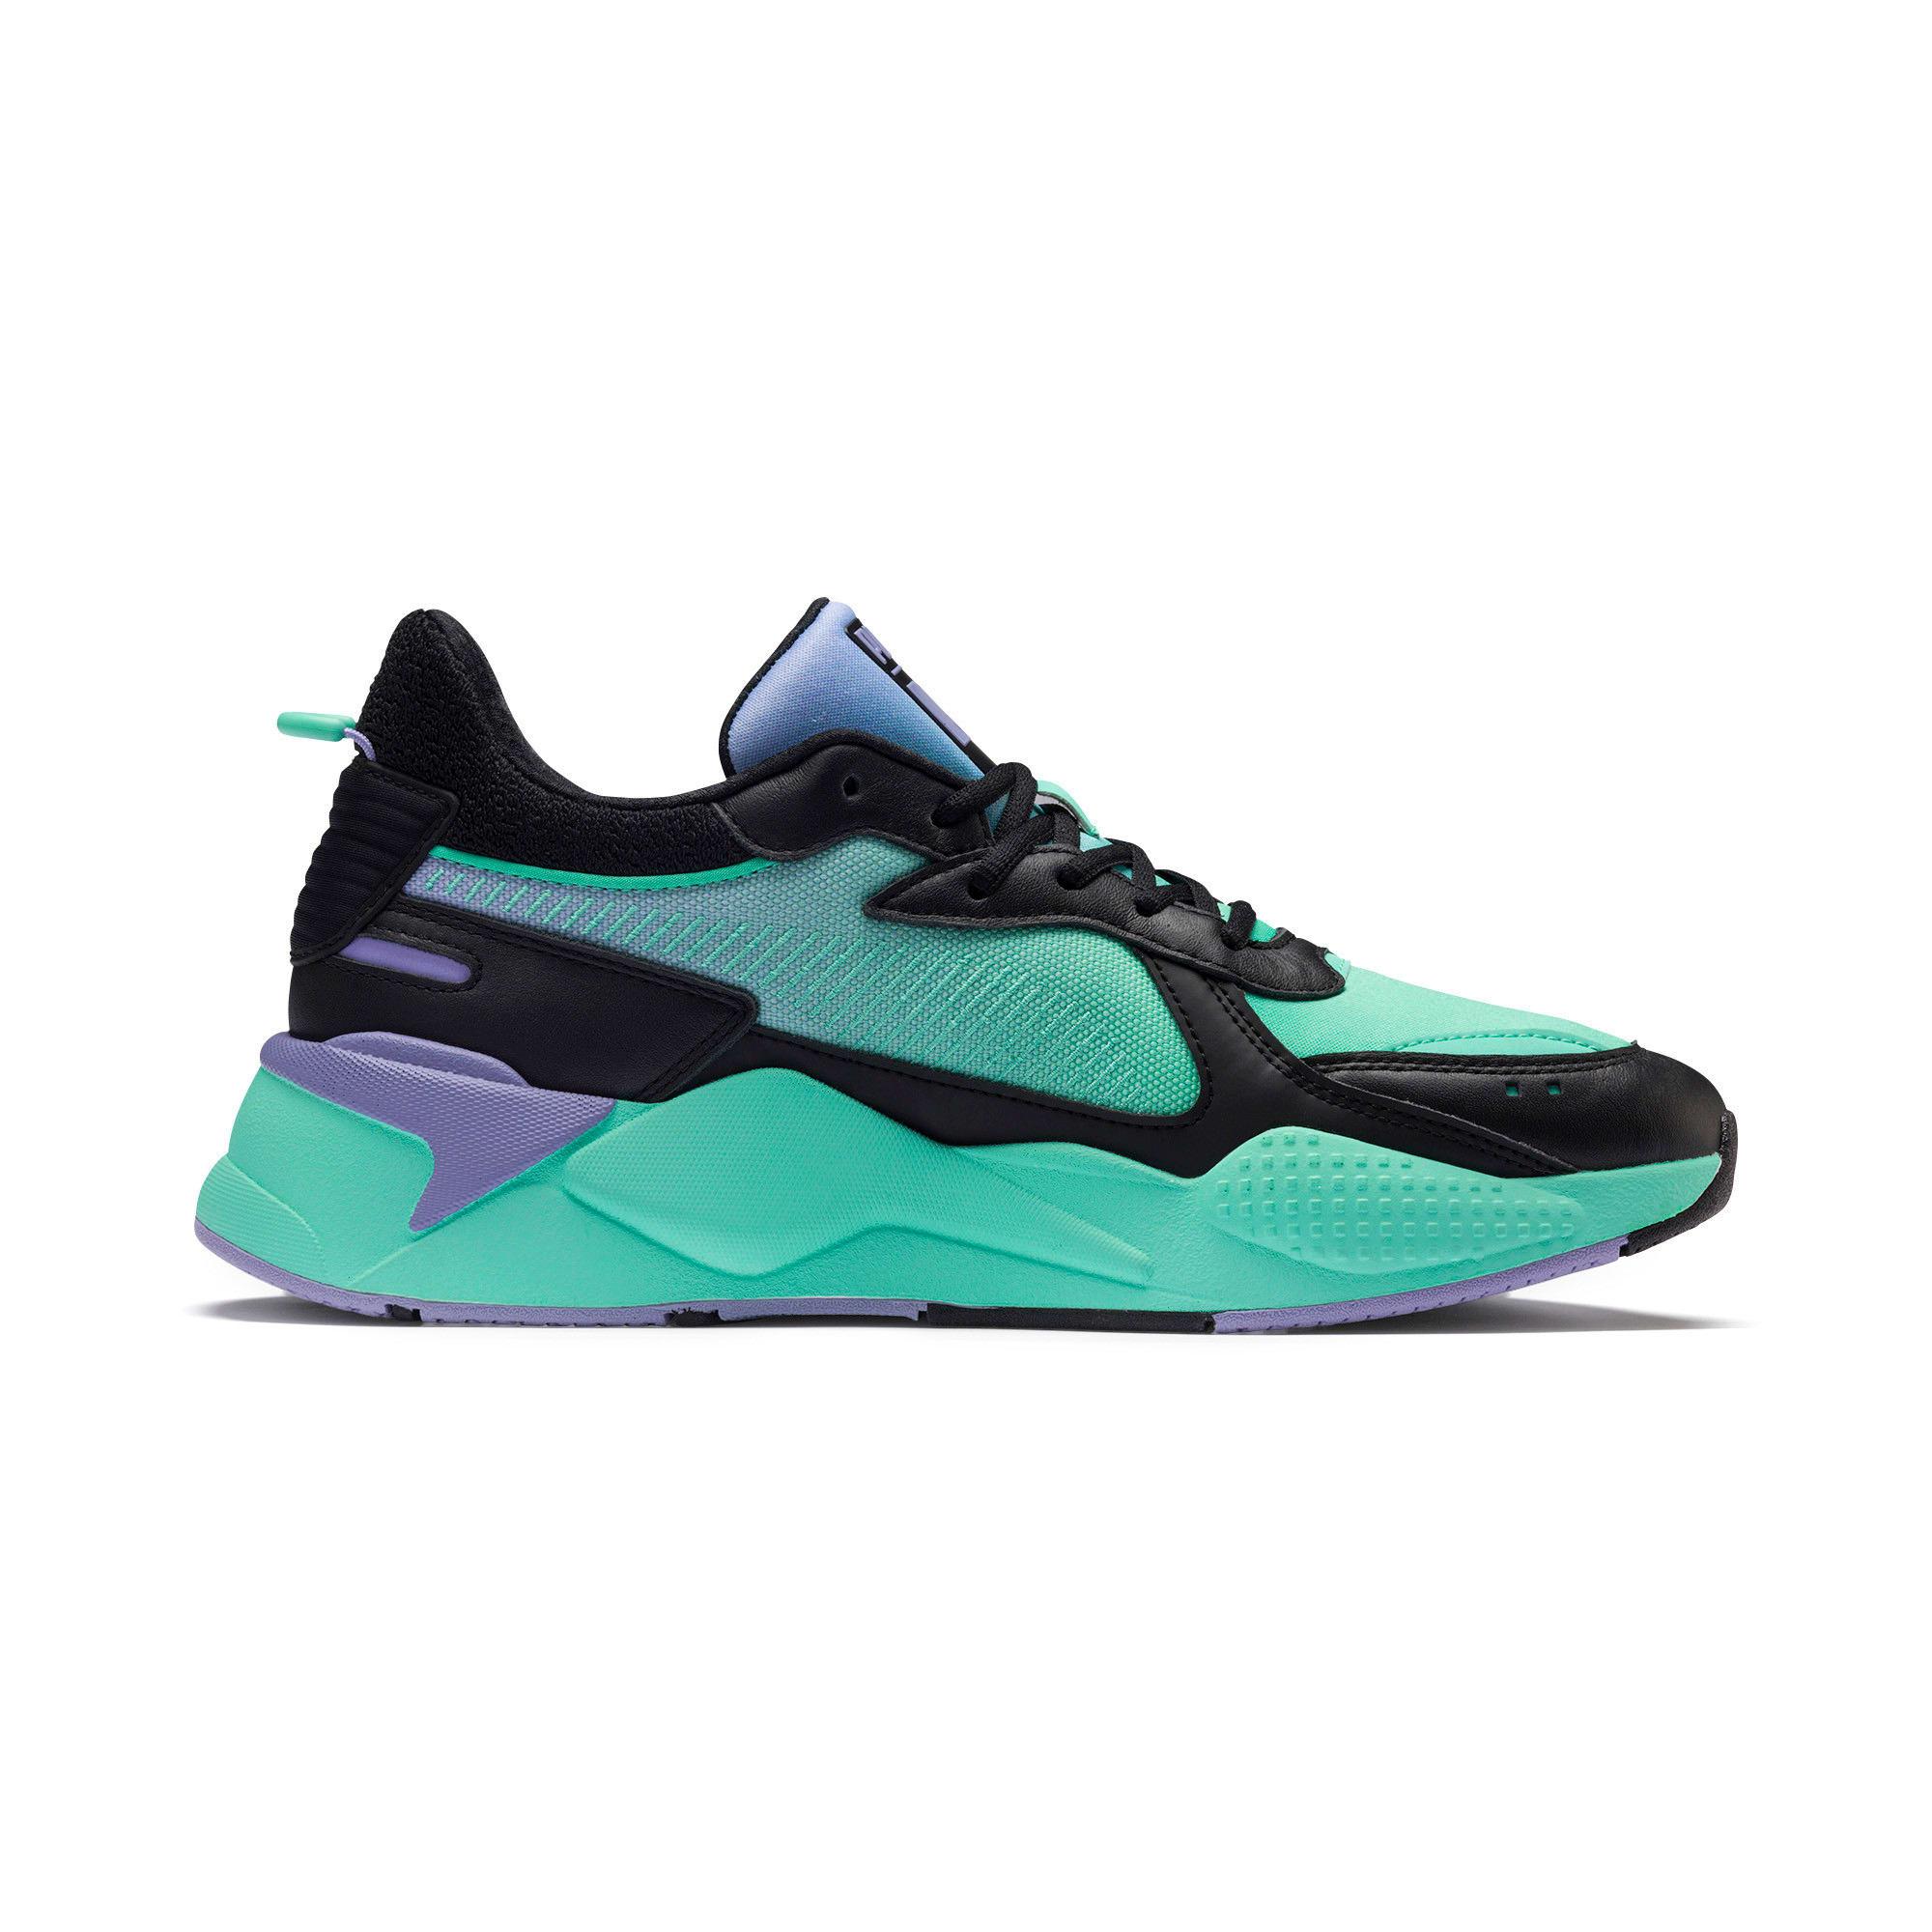 Thumbnail 5 of RS-X Tracks MTV Gradient Gloom Sneakers, Puma Black-Sweet Lavender, medium